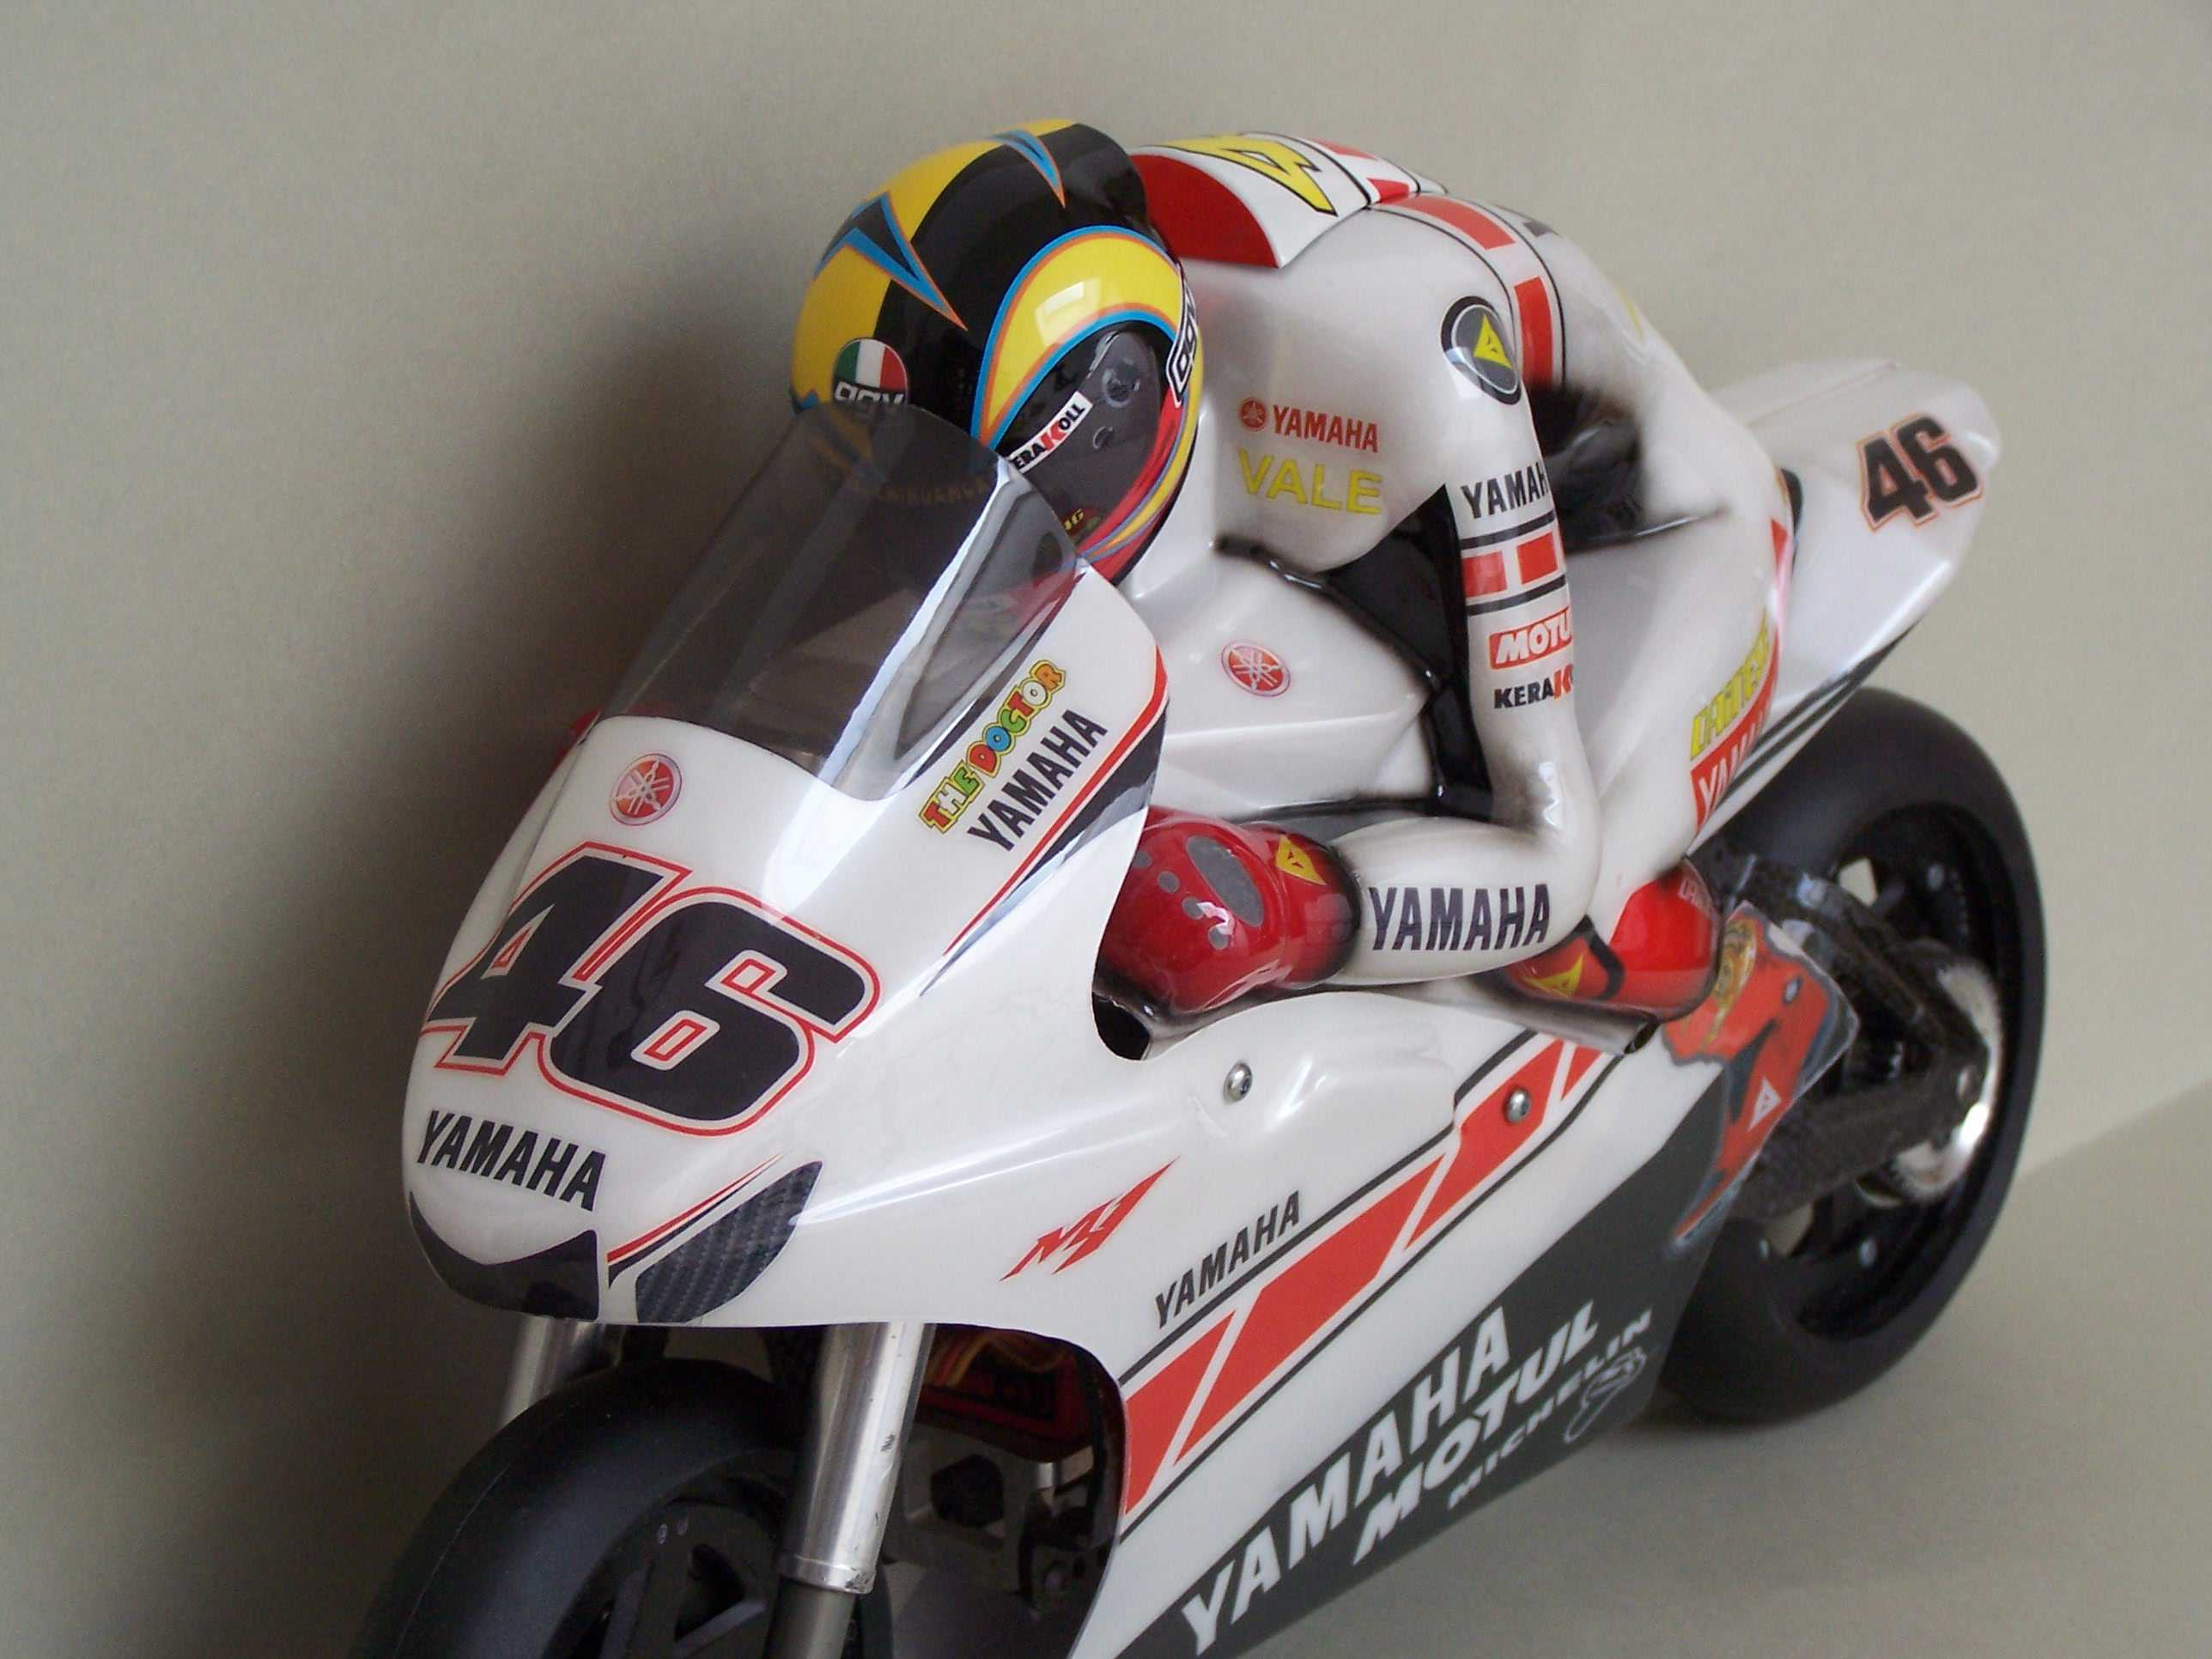 [Yamaha-Rossi-Valencia-2005-6.jpg]